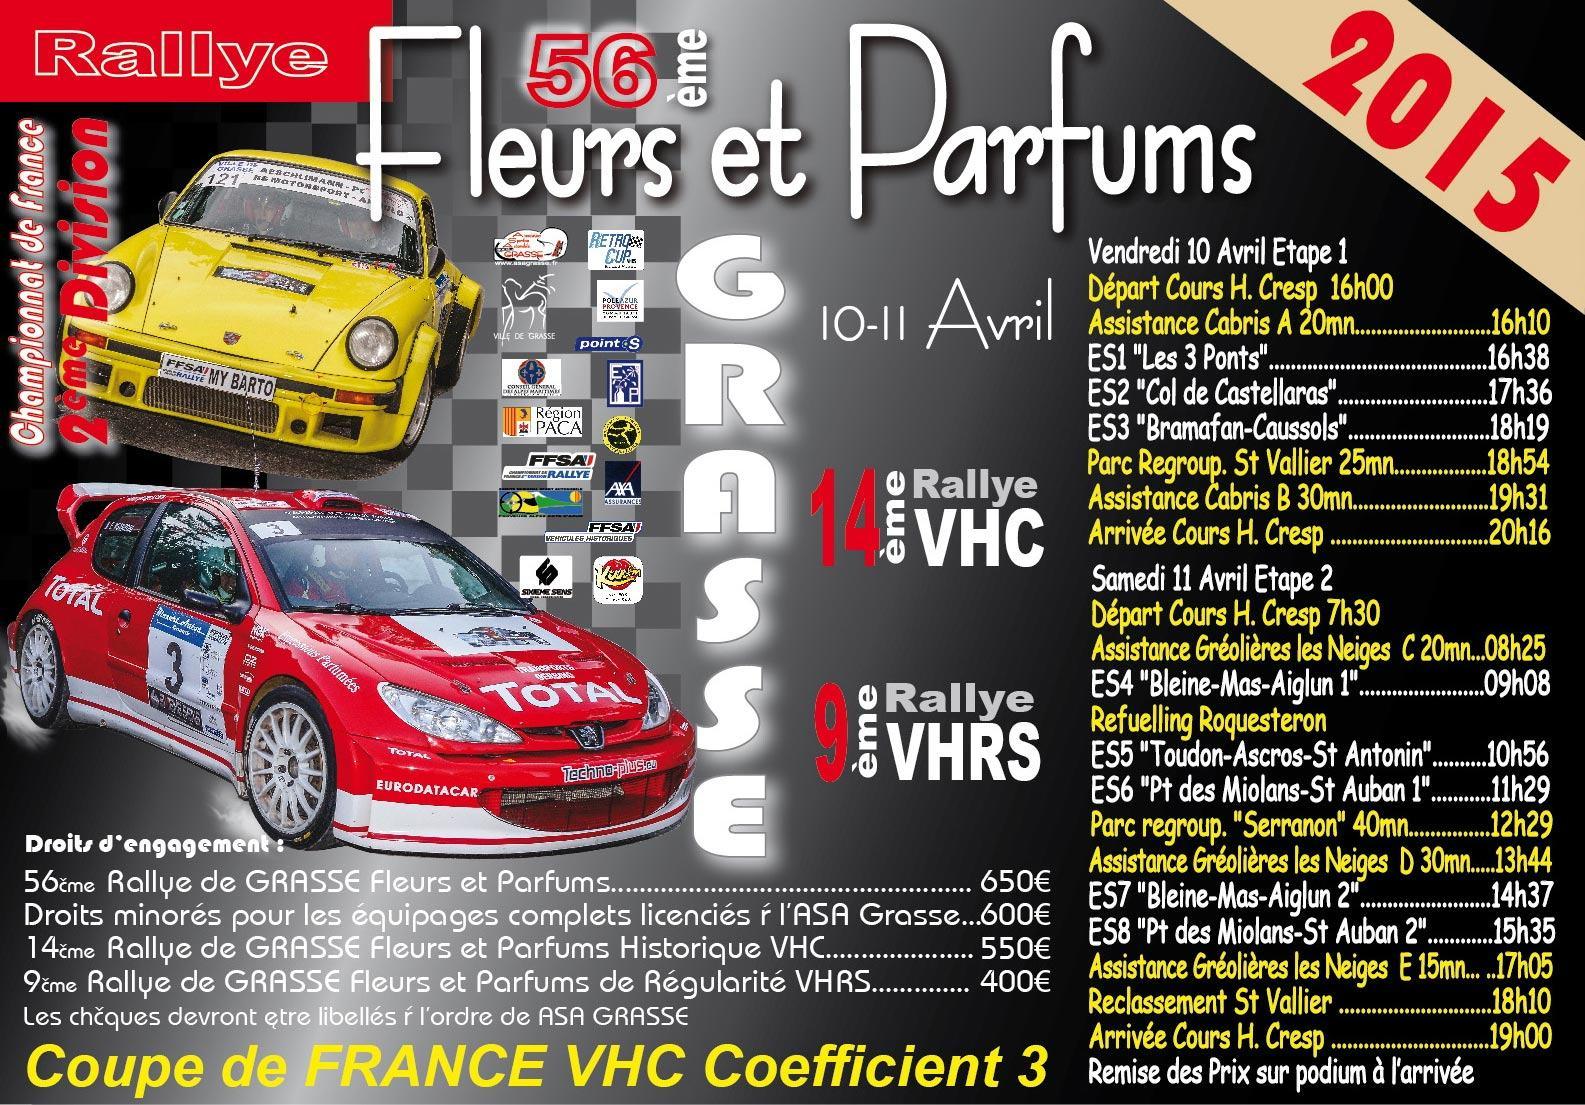 Rallye-de-Grasse-Fleurs-et-Parfums-2015